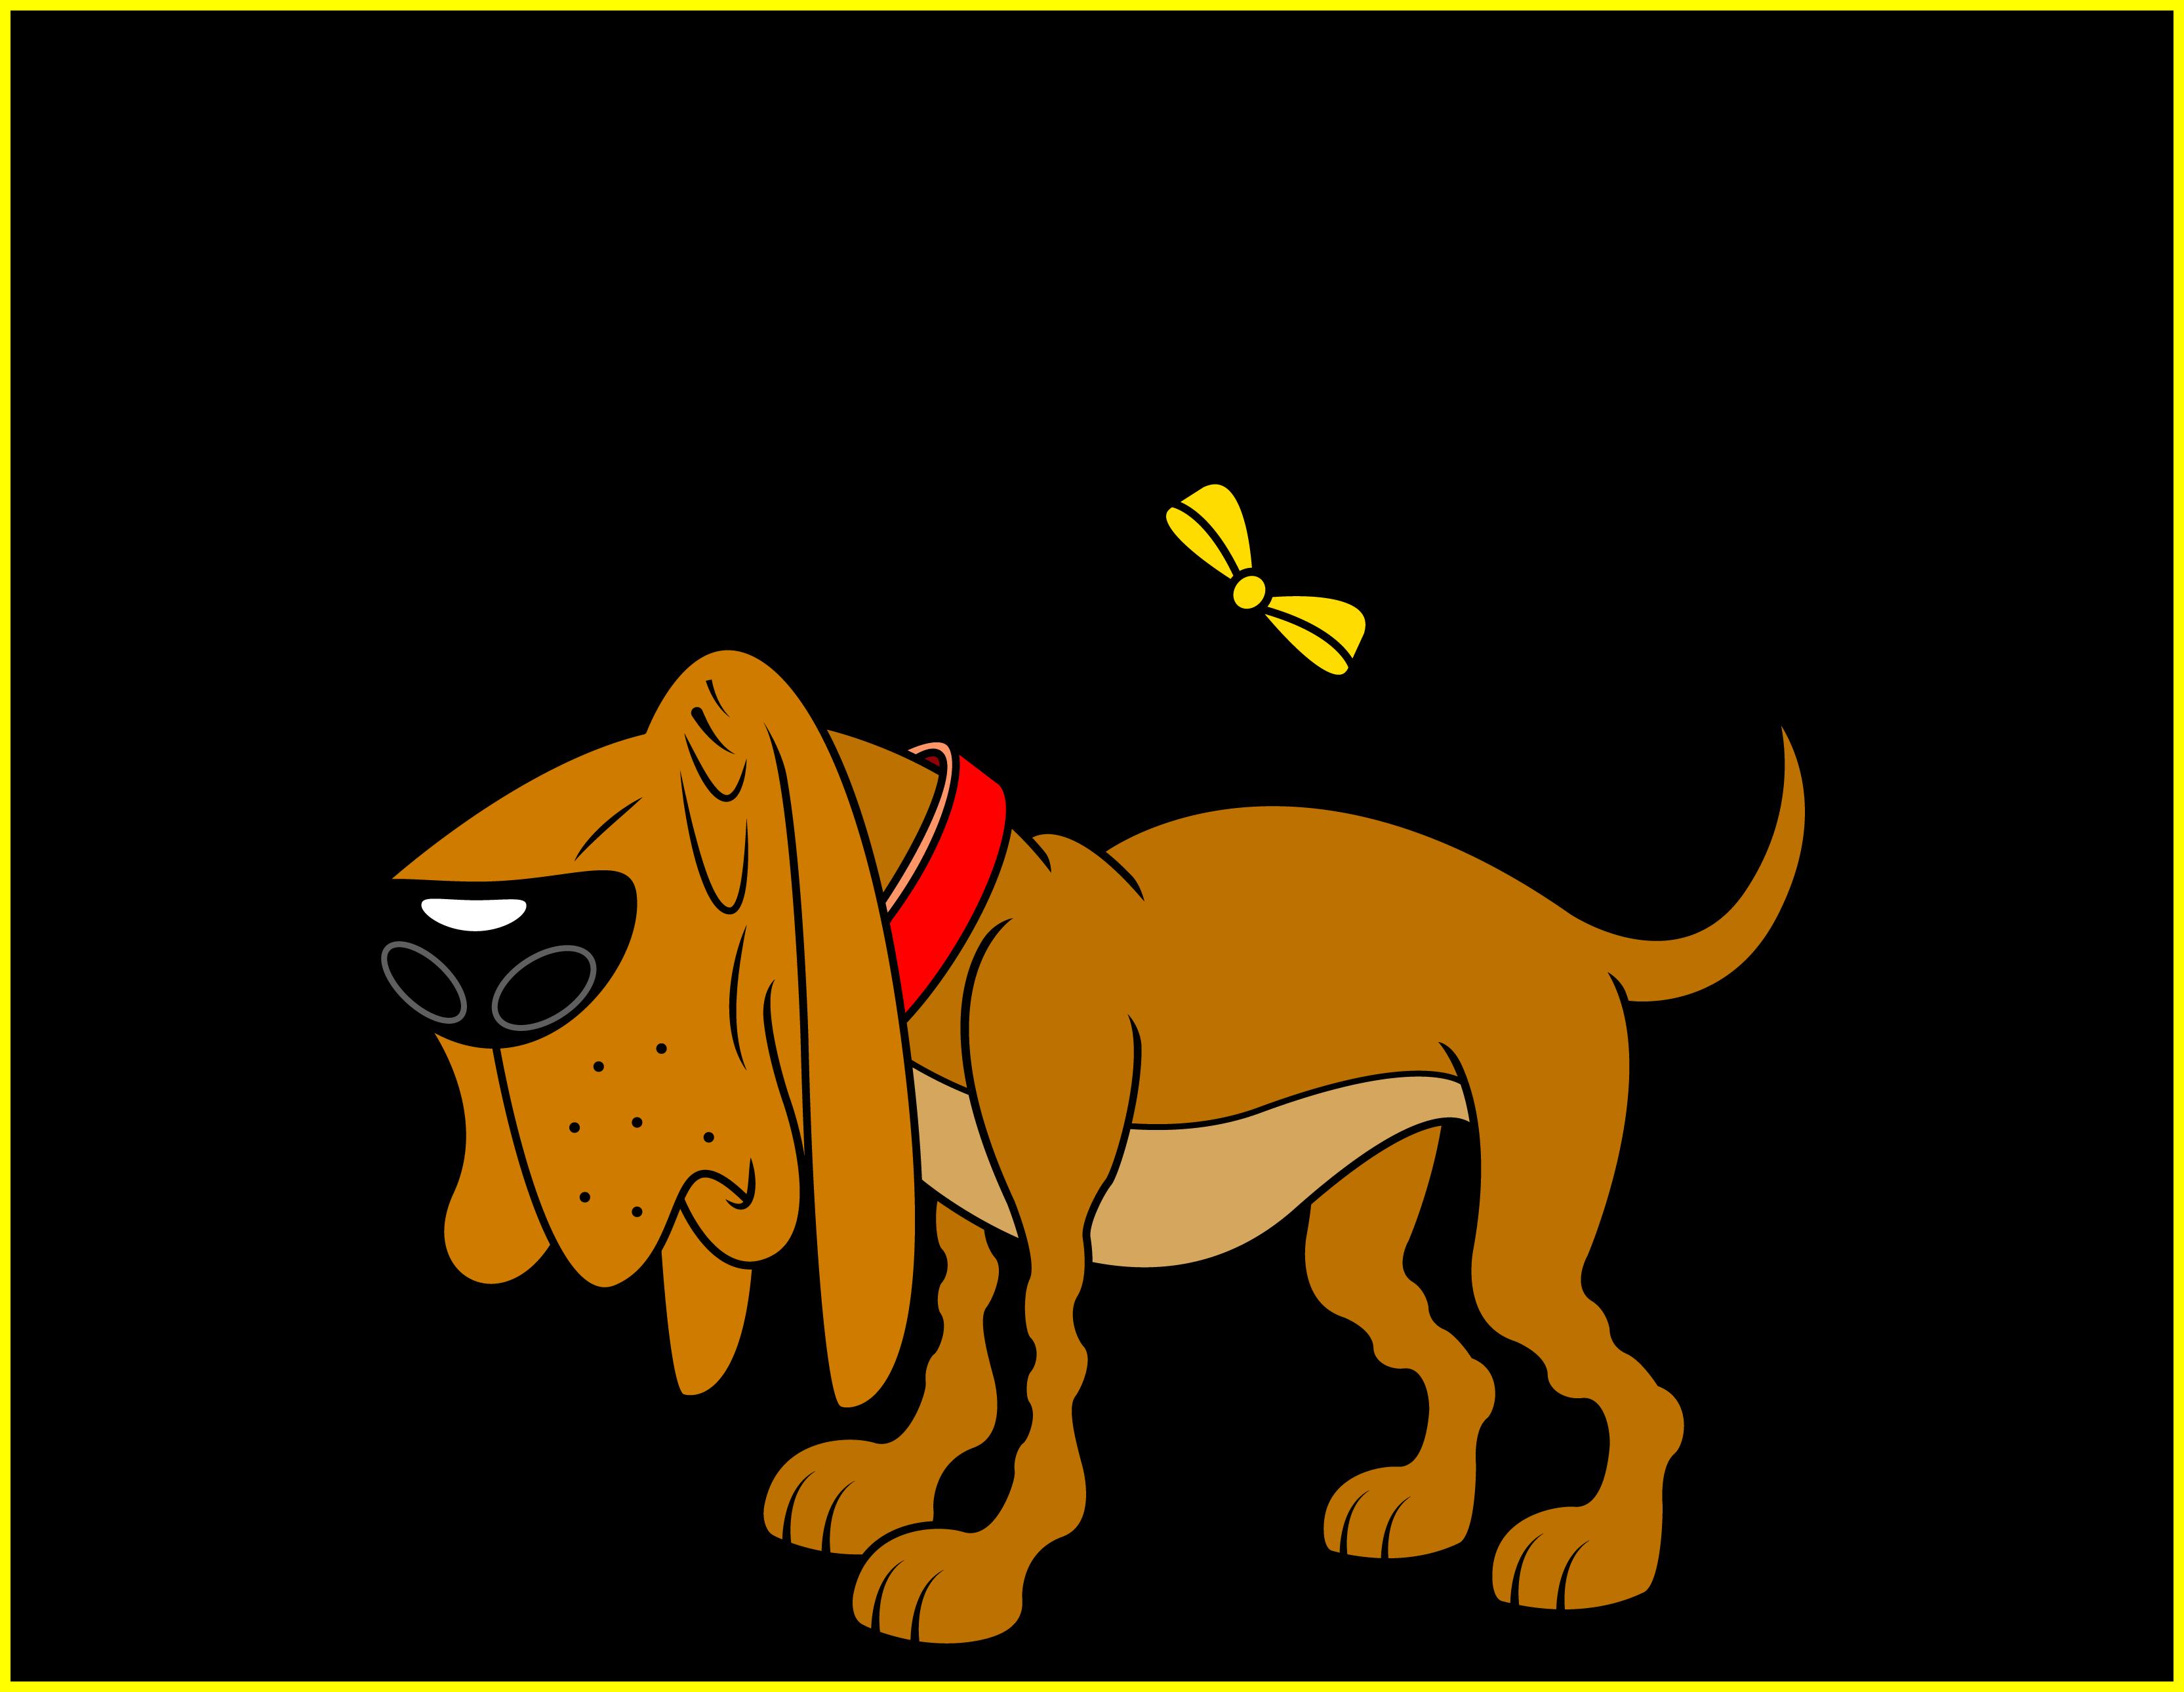 Clipart puppy st bernard. Saint at getdrawings com